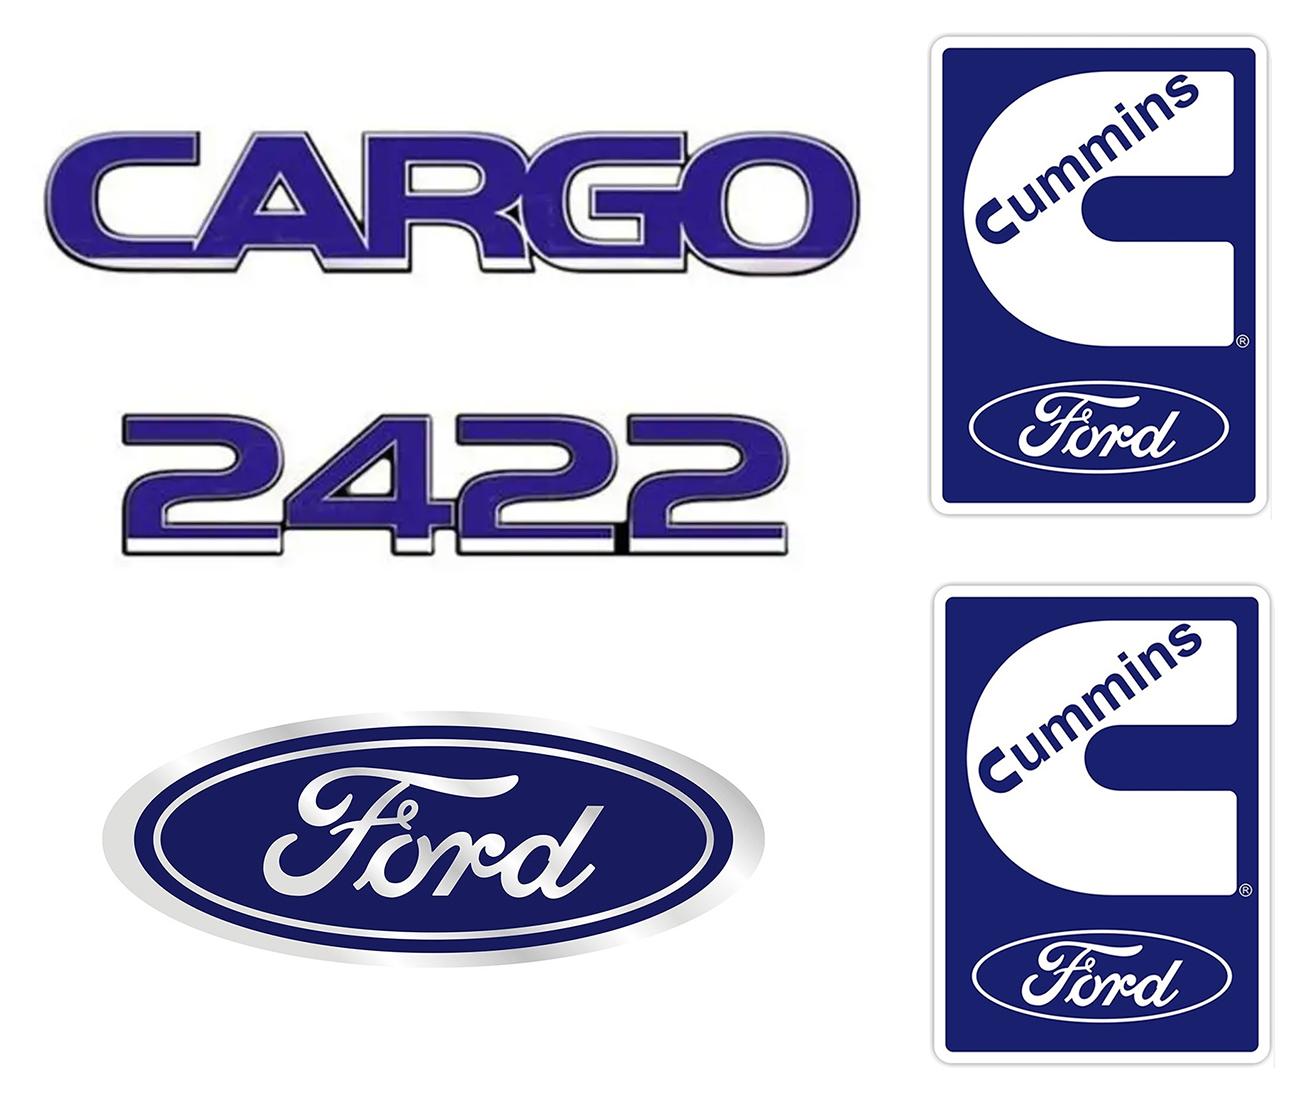 Emblema Ford Cargo 2422 Cummins - Kit